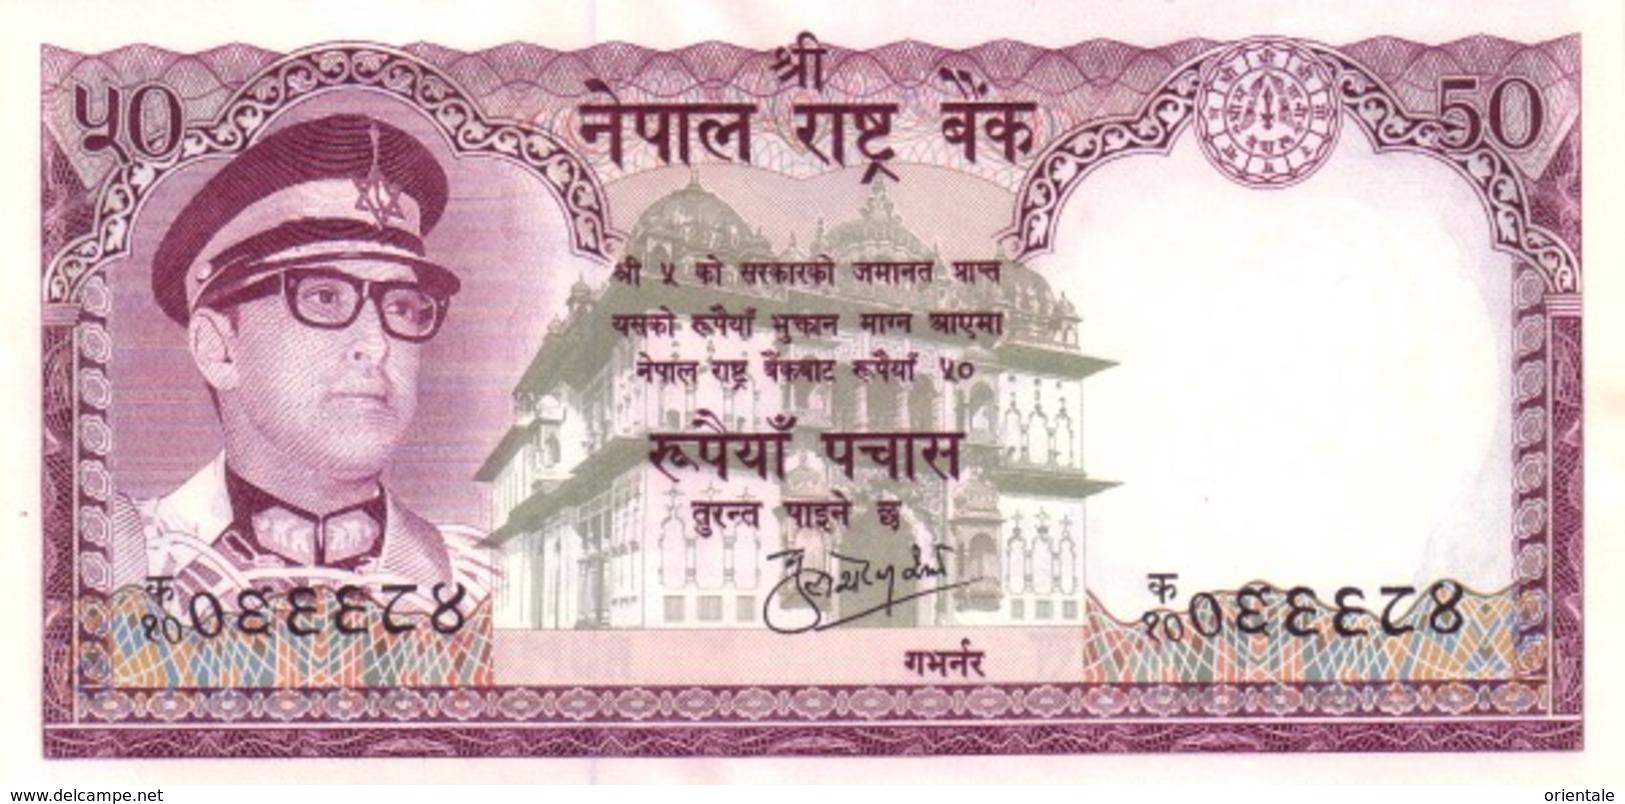 NEPAL P. 25 50 R 1974 UNC - Nepal